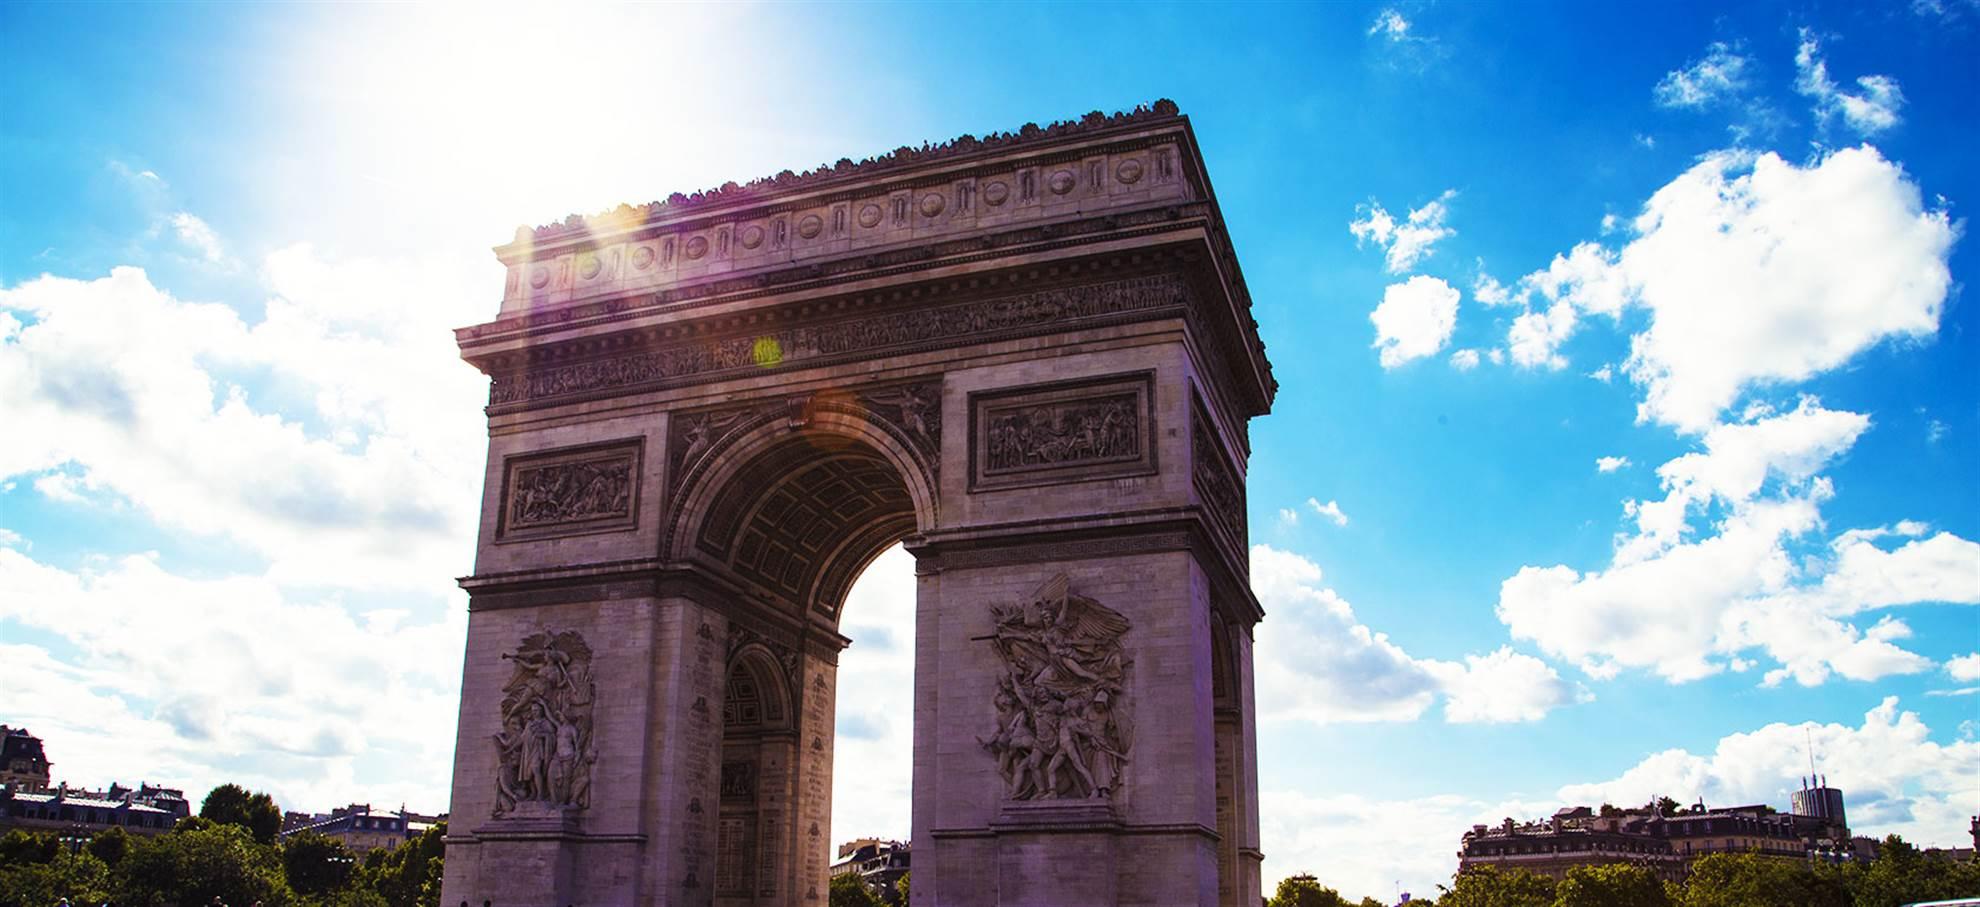 巴黎凯旋门 (Arc de Triomphe)